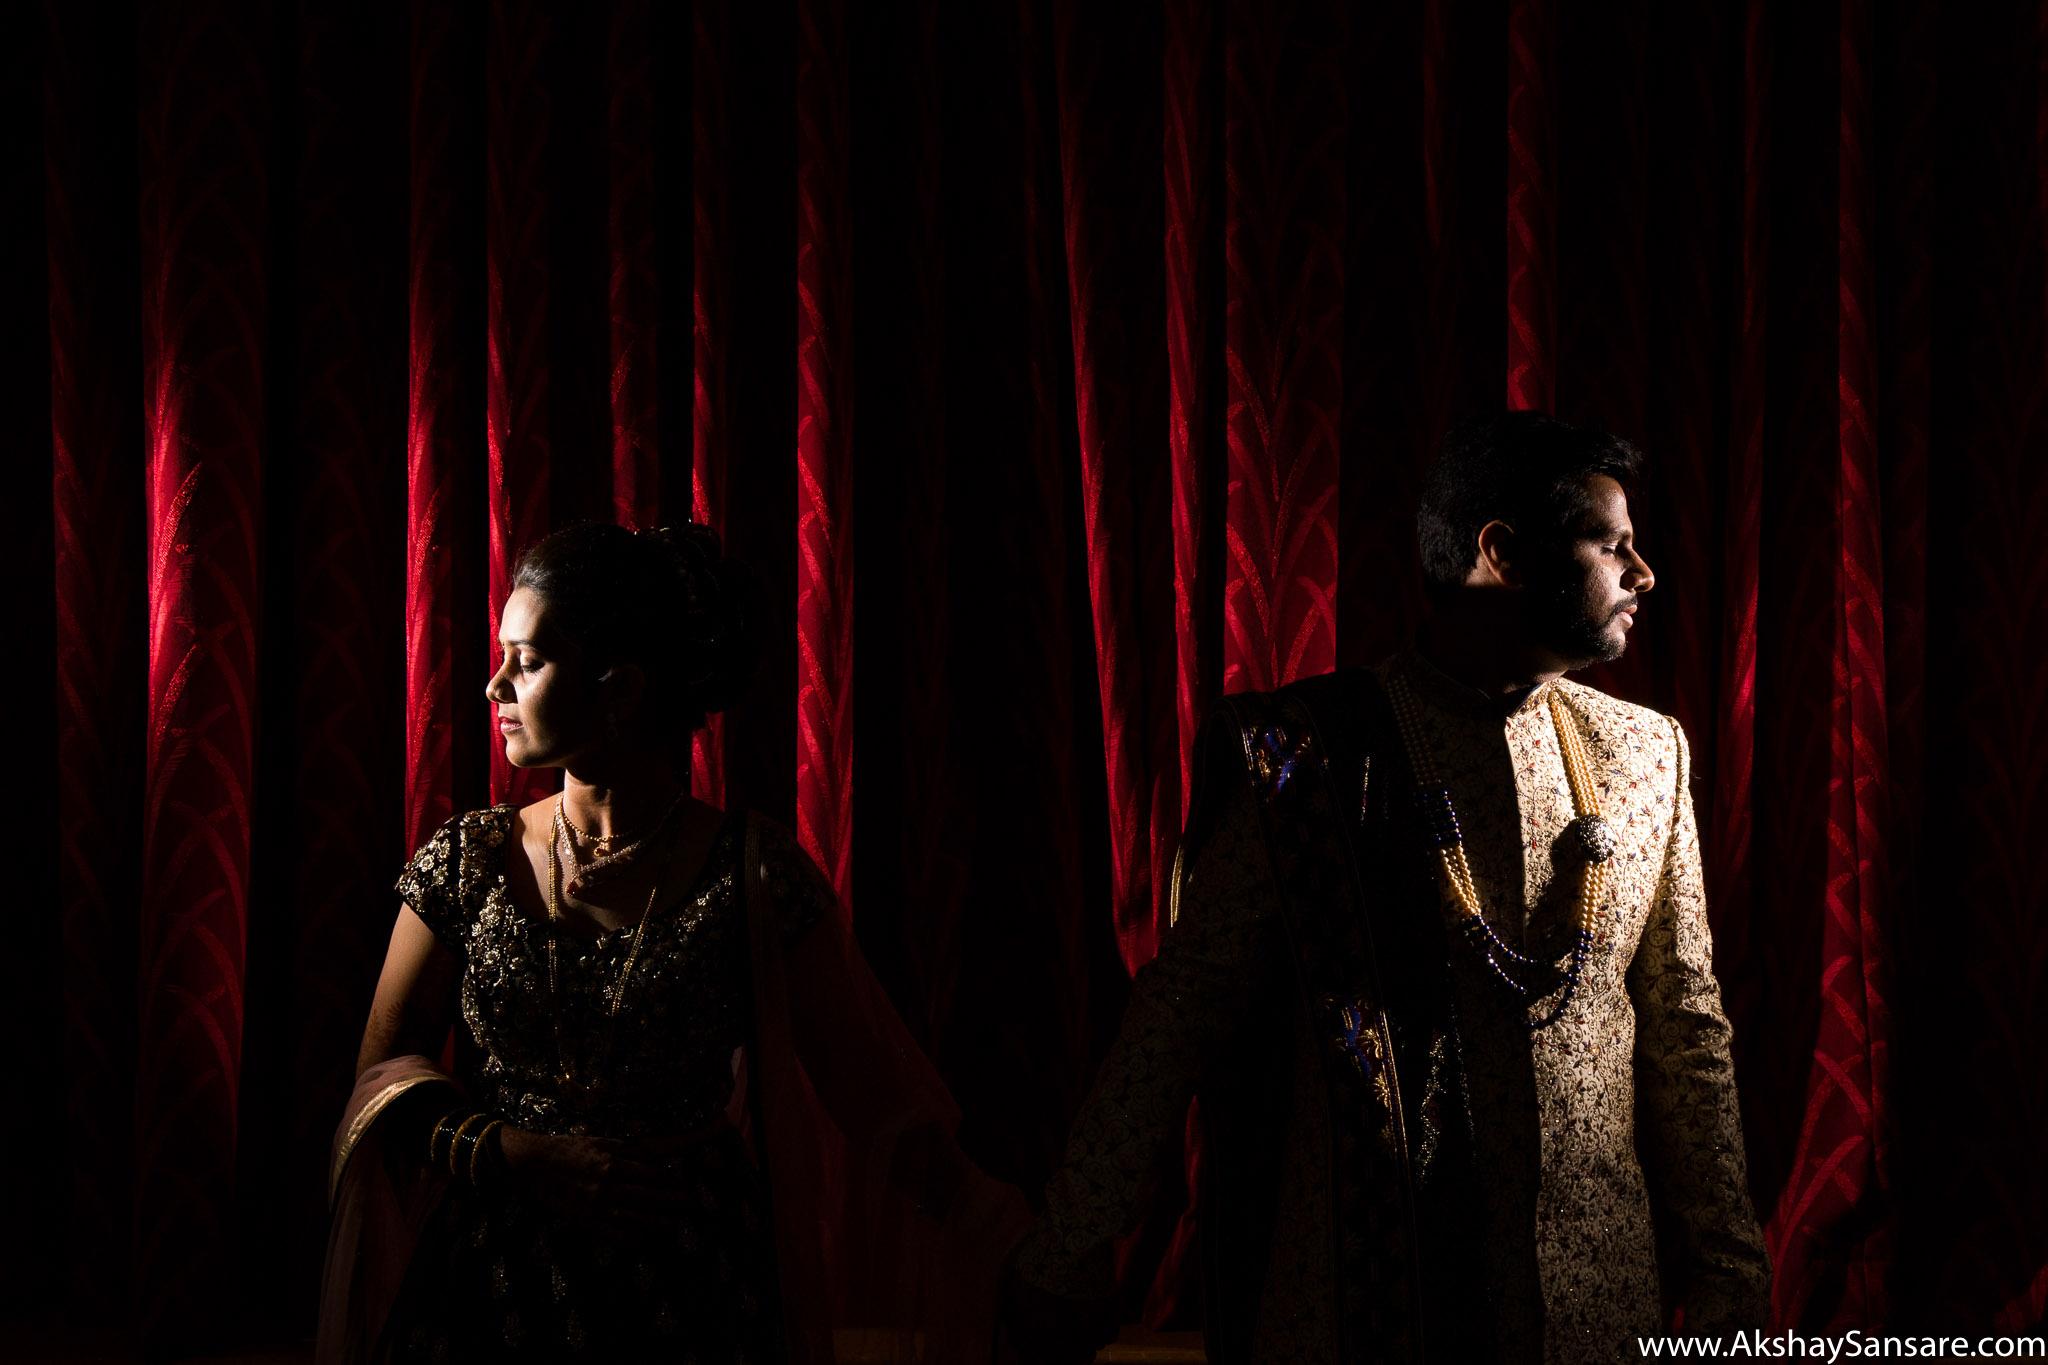 Aditya x Poonam Blog Akshay Sansare Photography Candid Photographer in Mumbai Best Cinematic wedding film filmer-27.jpg